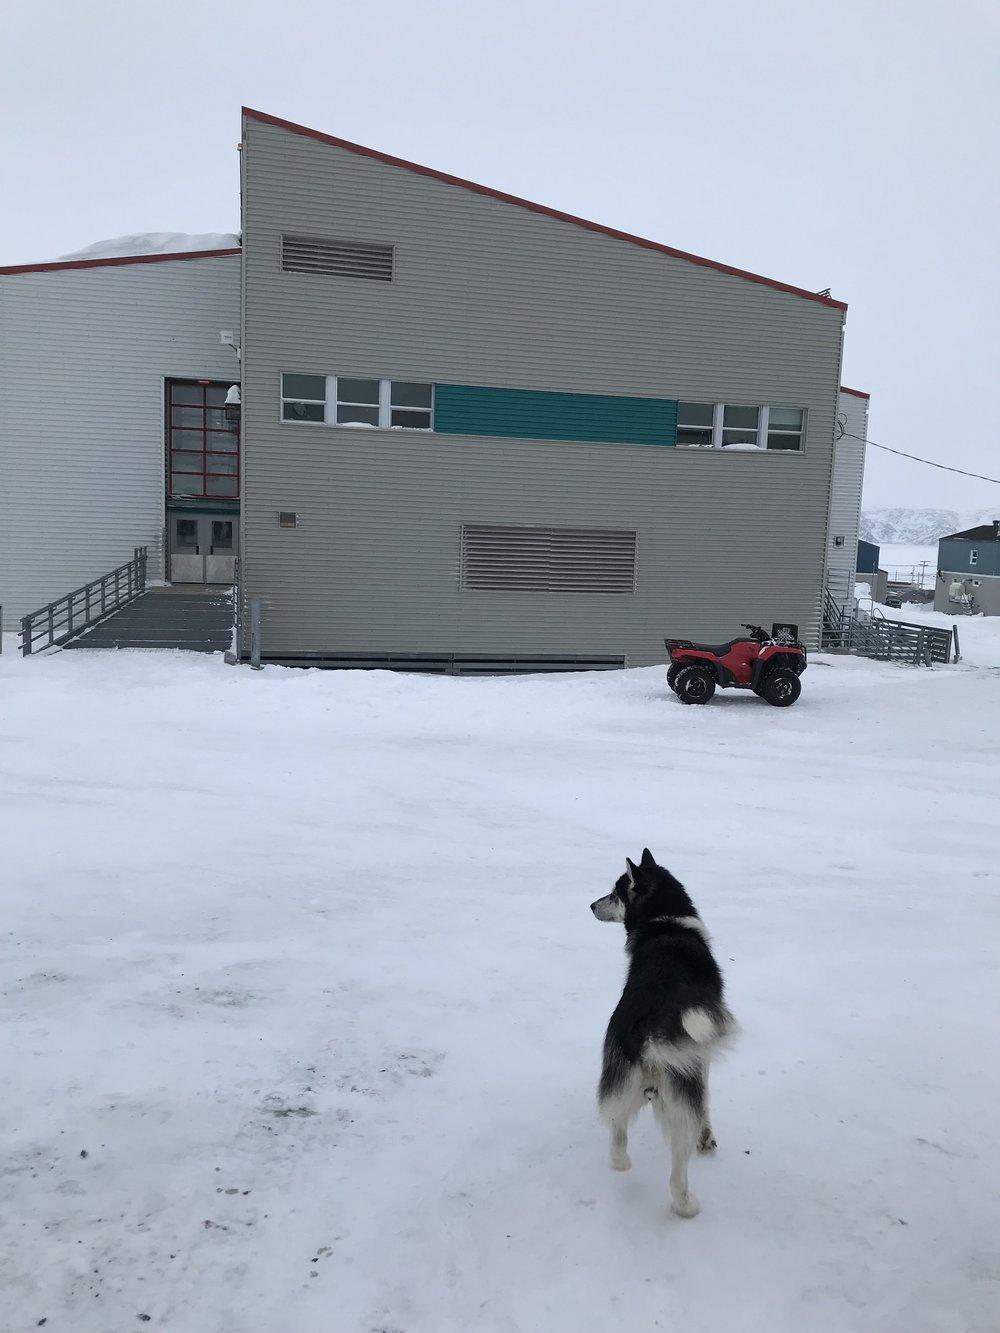 Arsenic School (and cute dog escort)